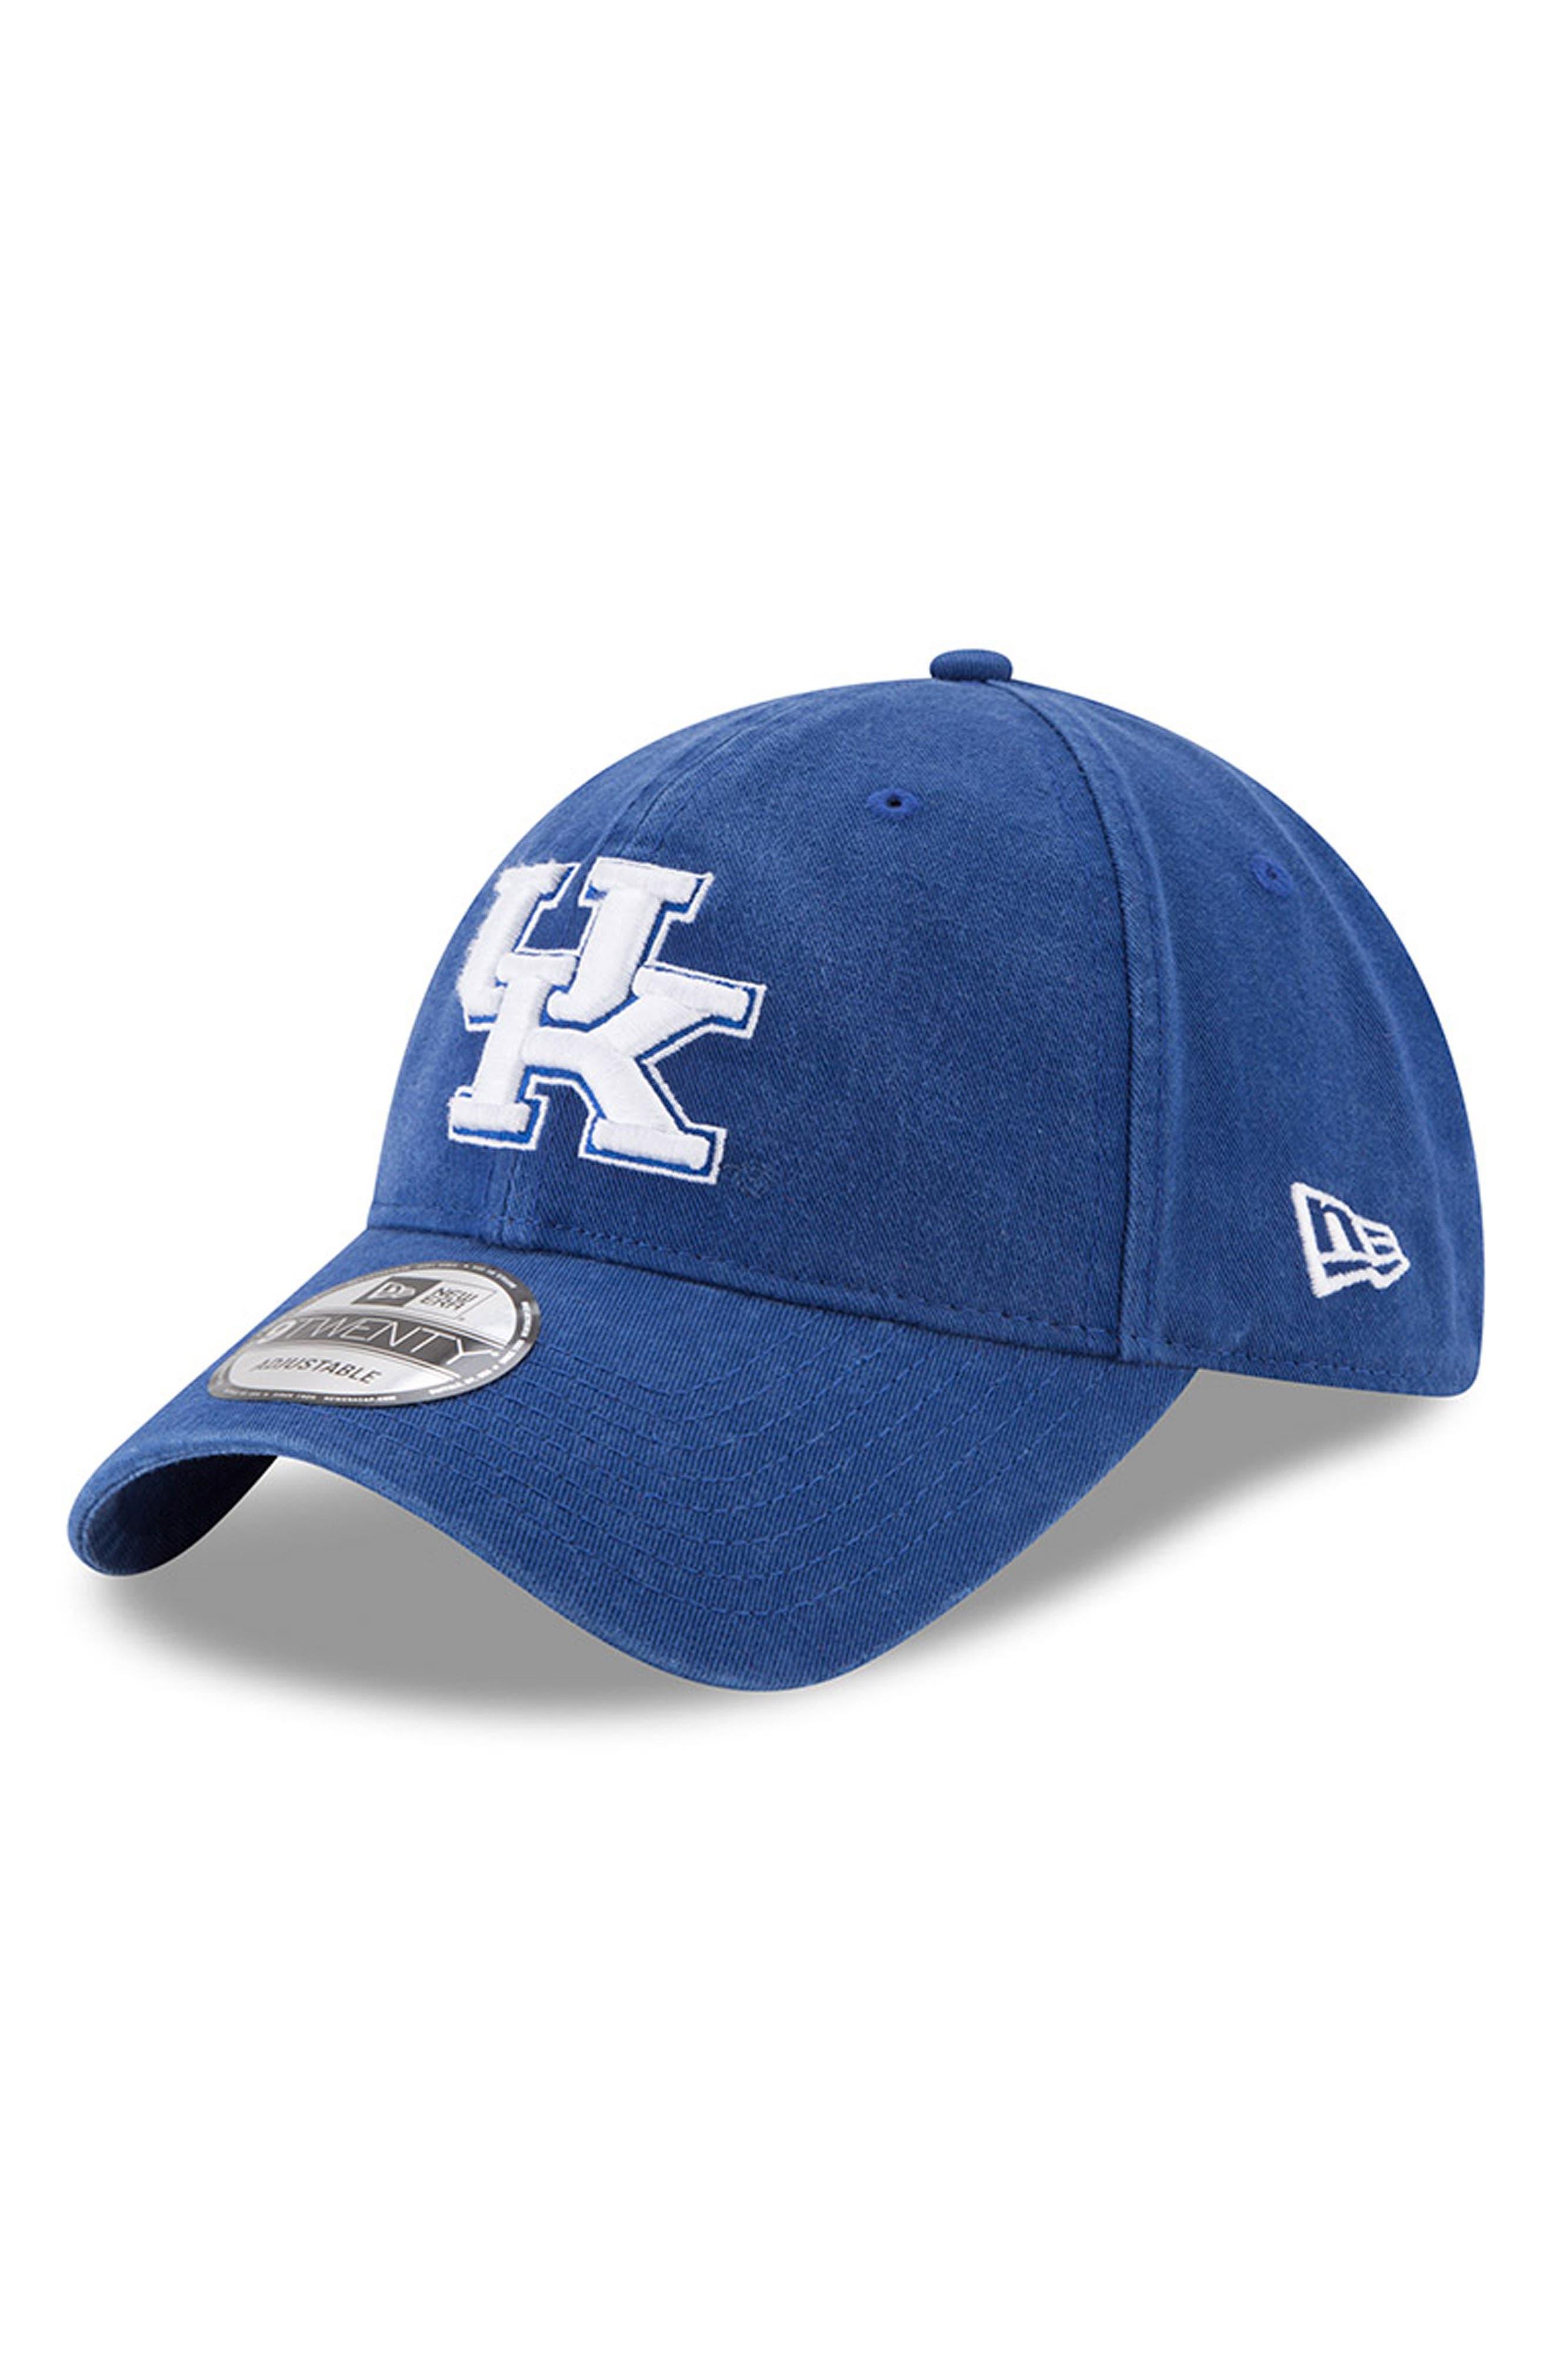 Alternate Image 1 Selected - New Era Collegiate Core Classic - Kentucky Wildcats Baseball Cap